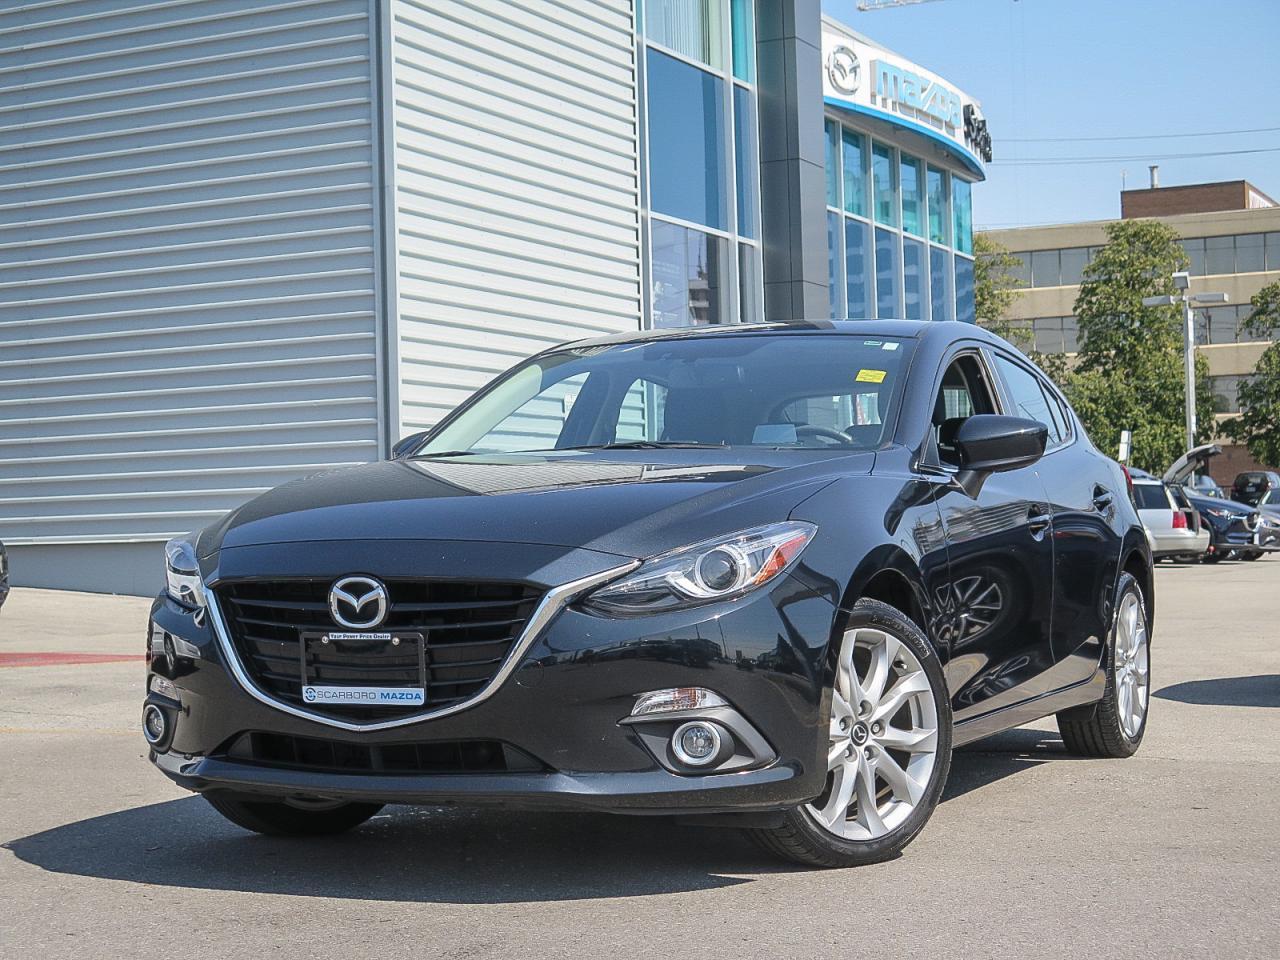 2014 Mazda MAZDA3 GT LEATHER 0.9% FINANCE!!